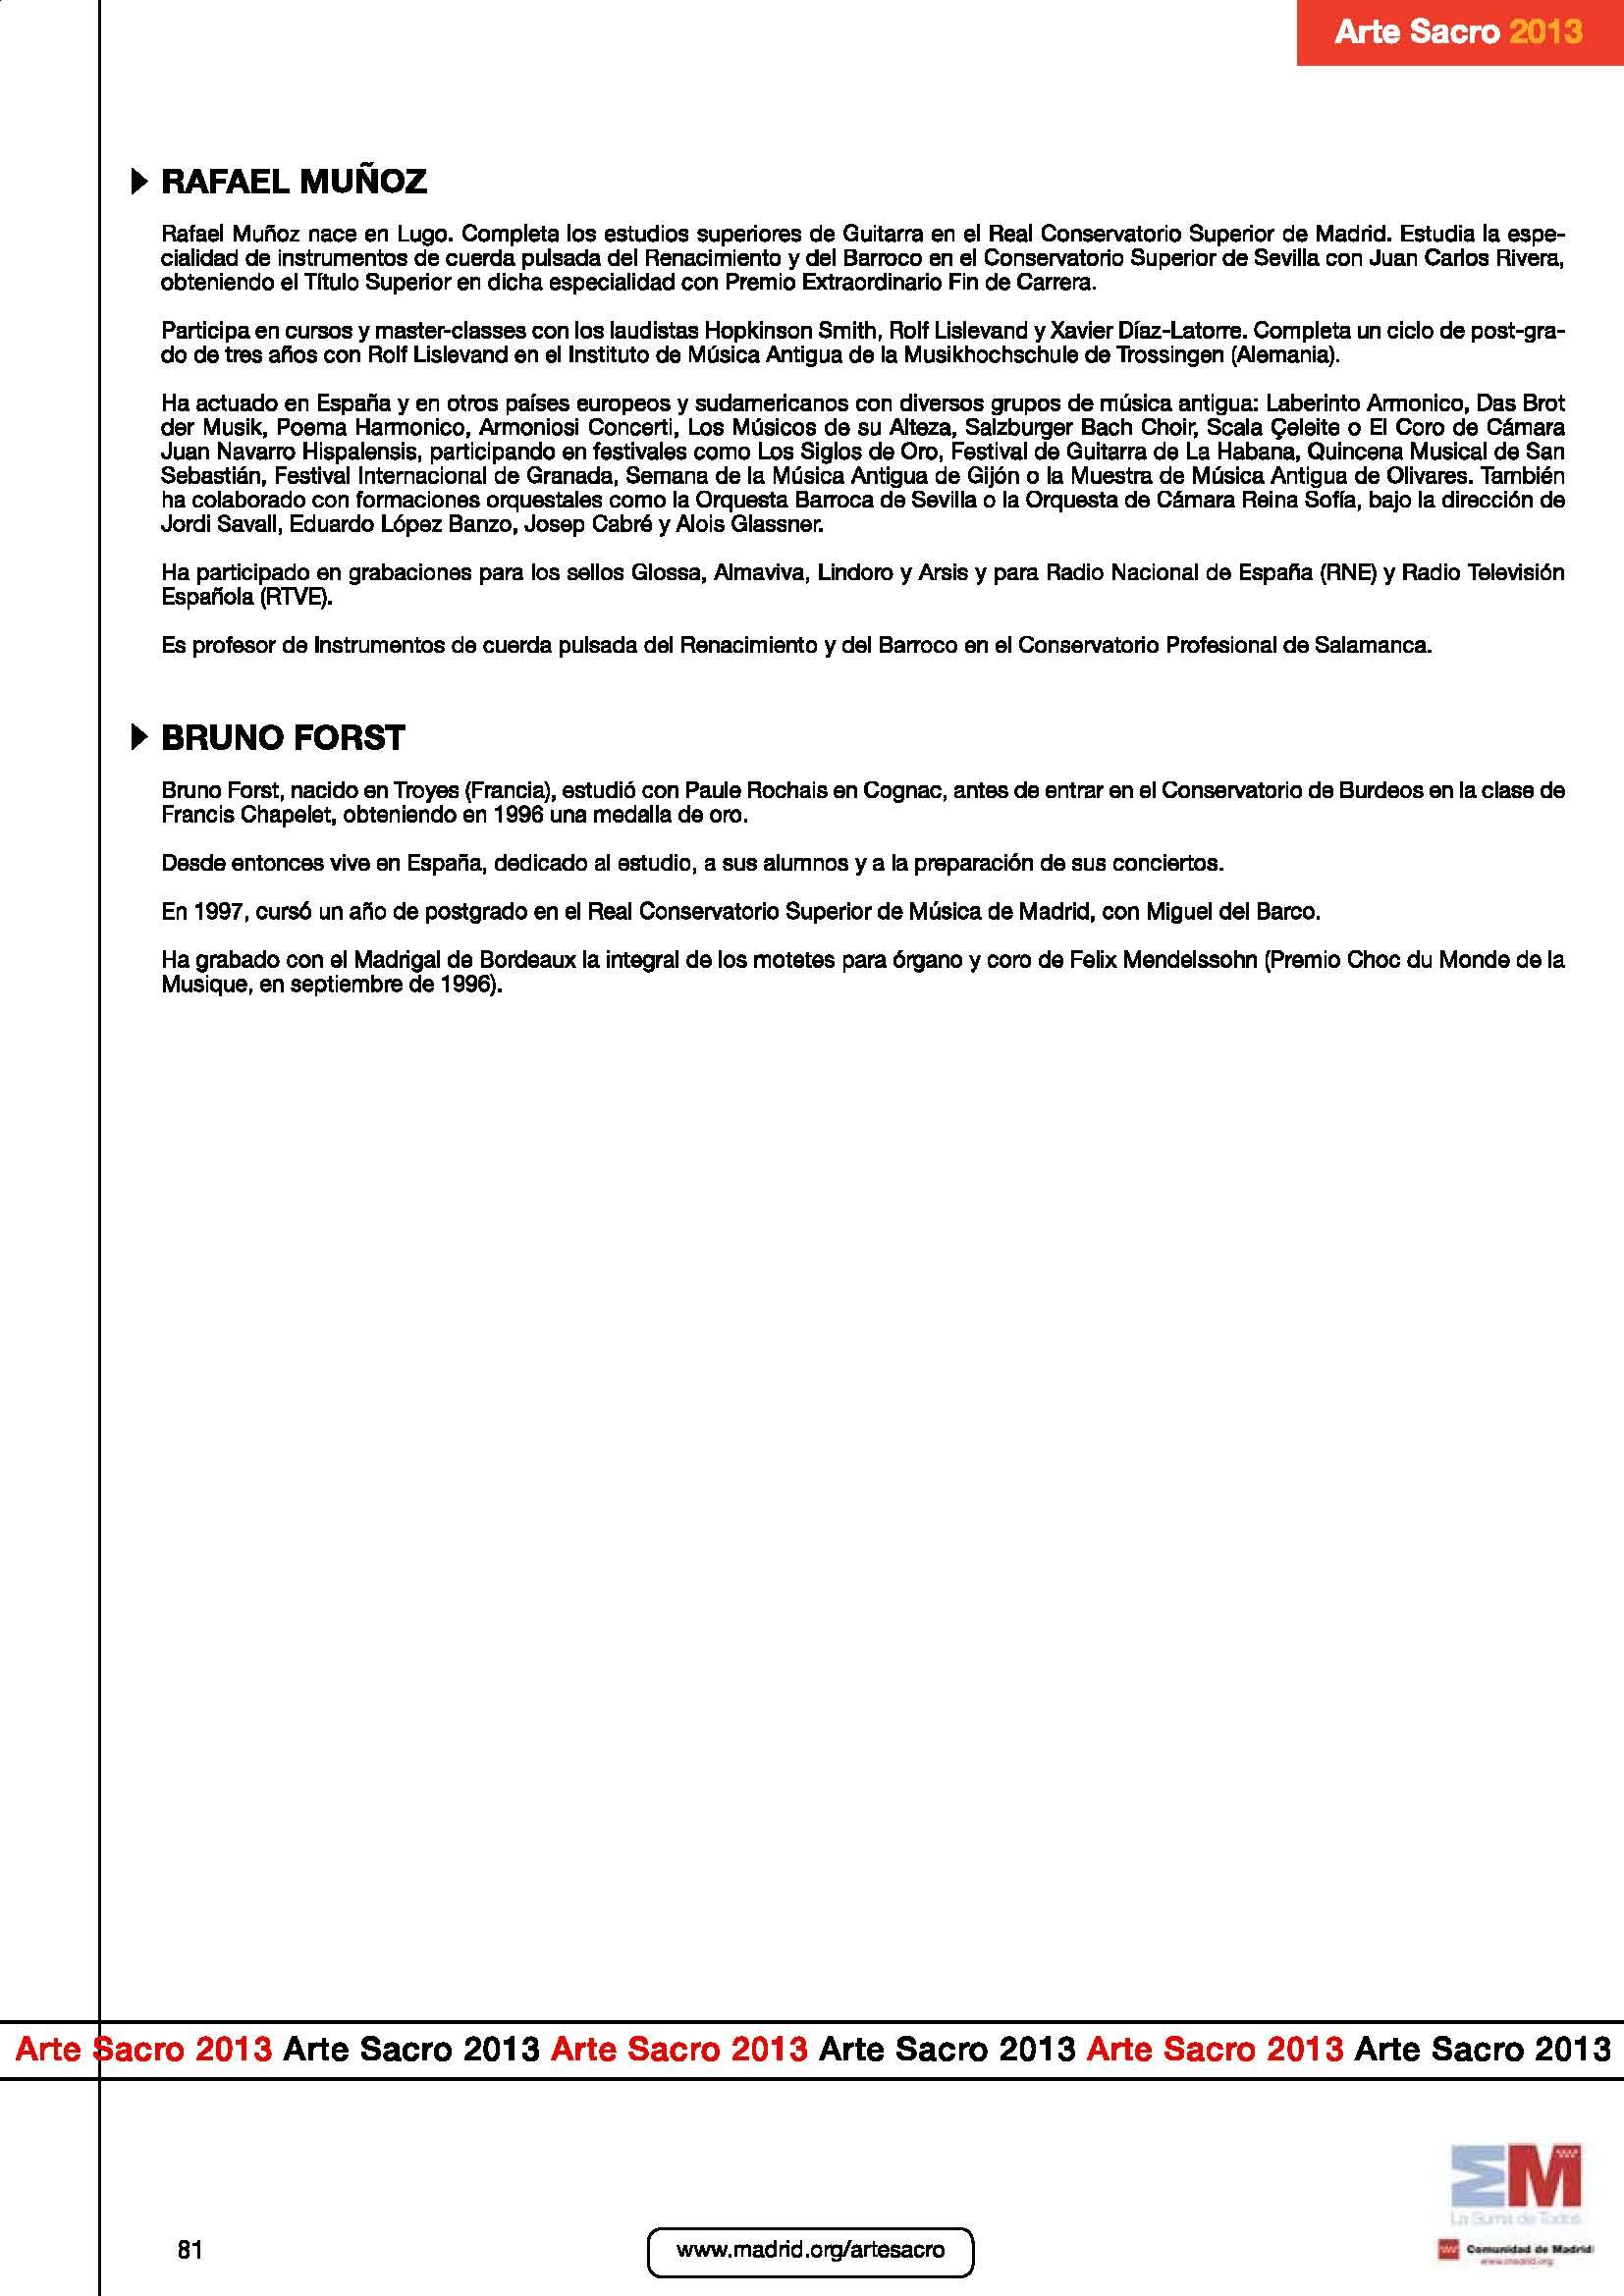 dossier_completo_Página_081